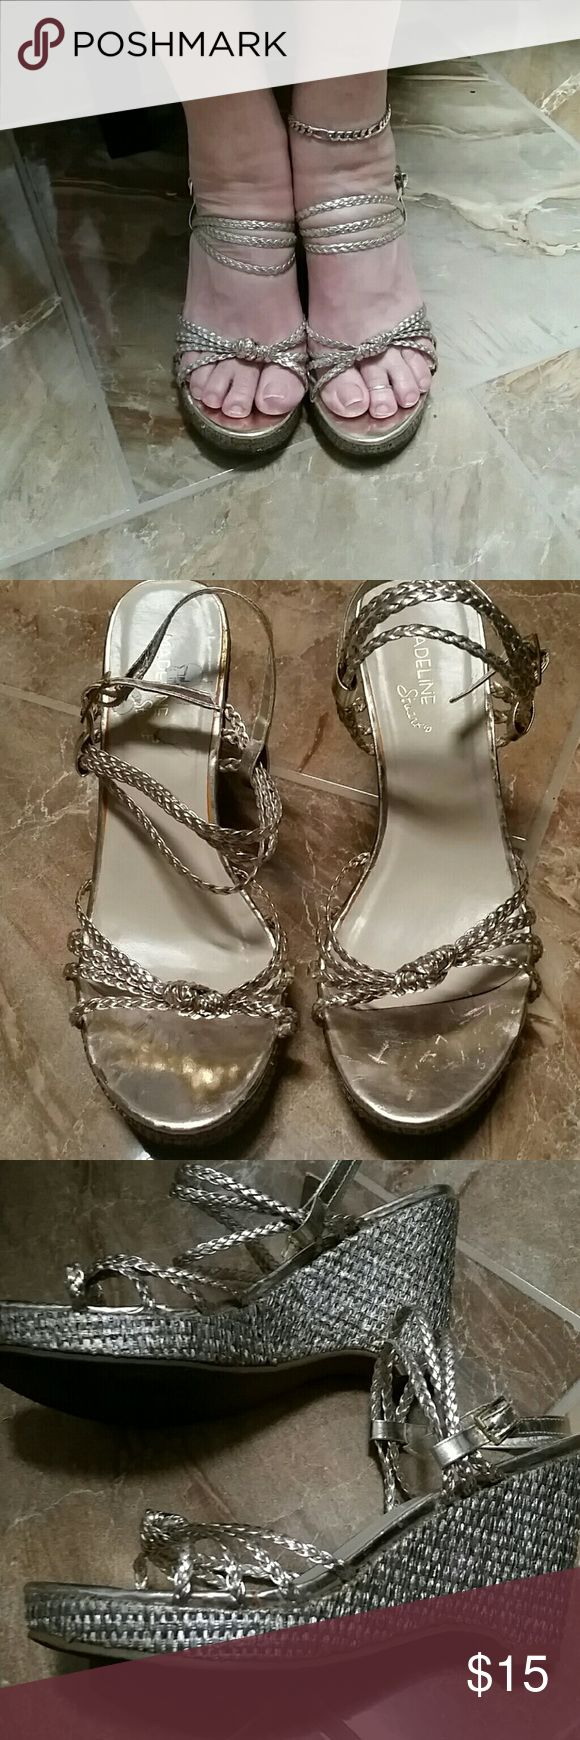 Gold wedge heels Super cute and comfy gold wedge heels Madeline Stuart Shoes Wedges